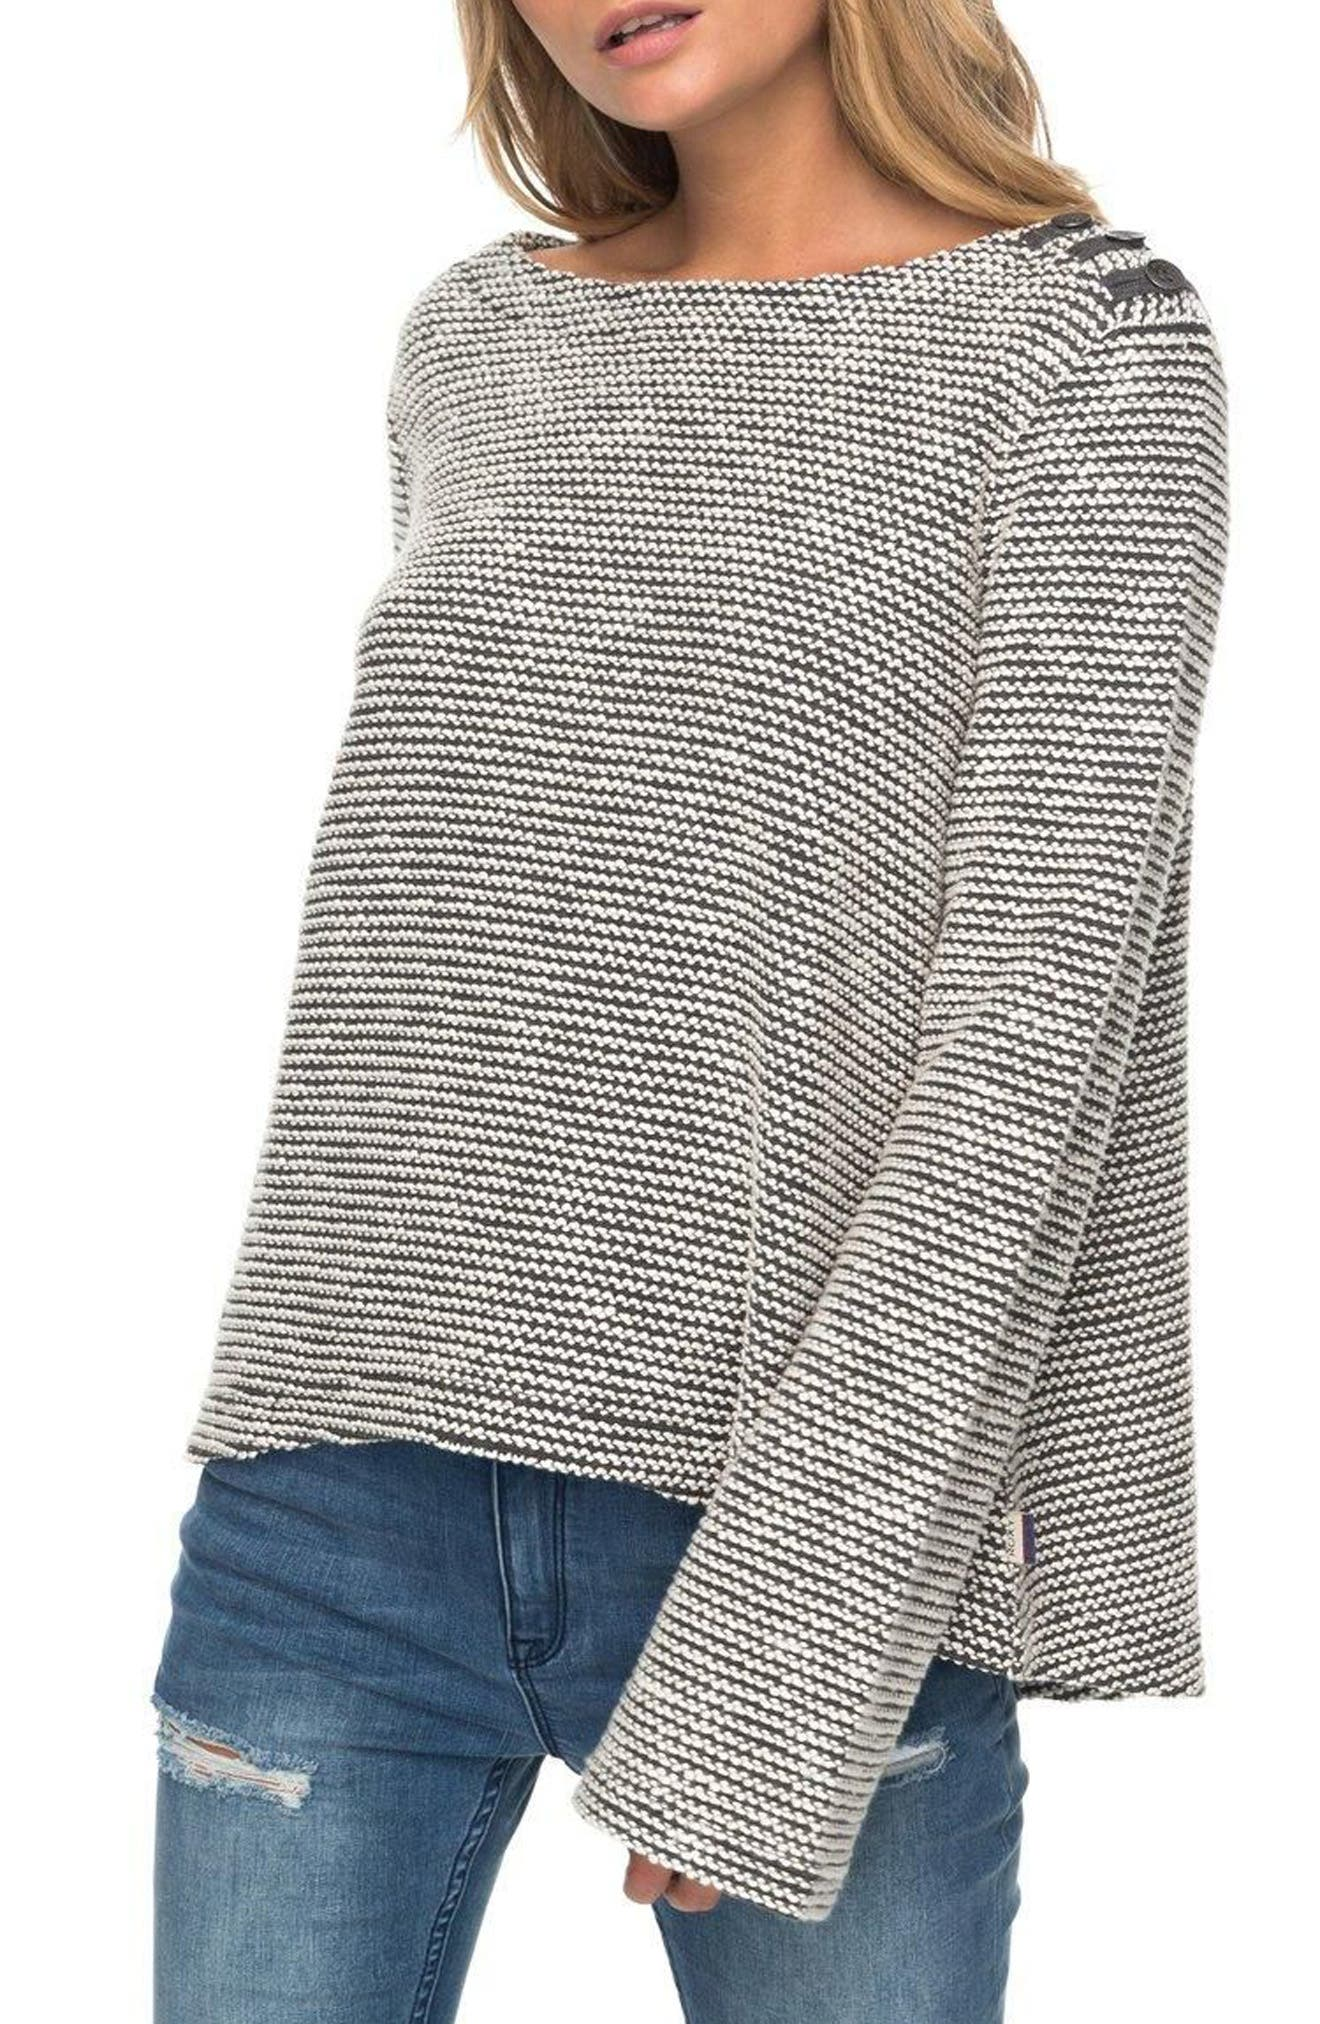 Free Thinking Sweatshirt,                         Main,                         color, 020